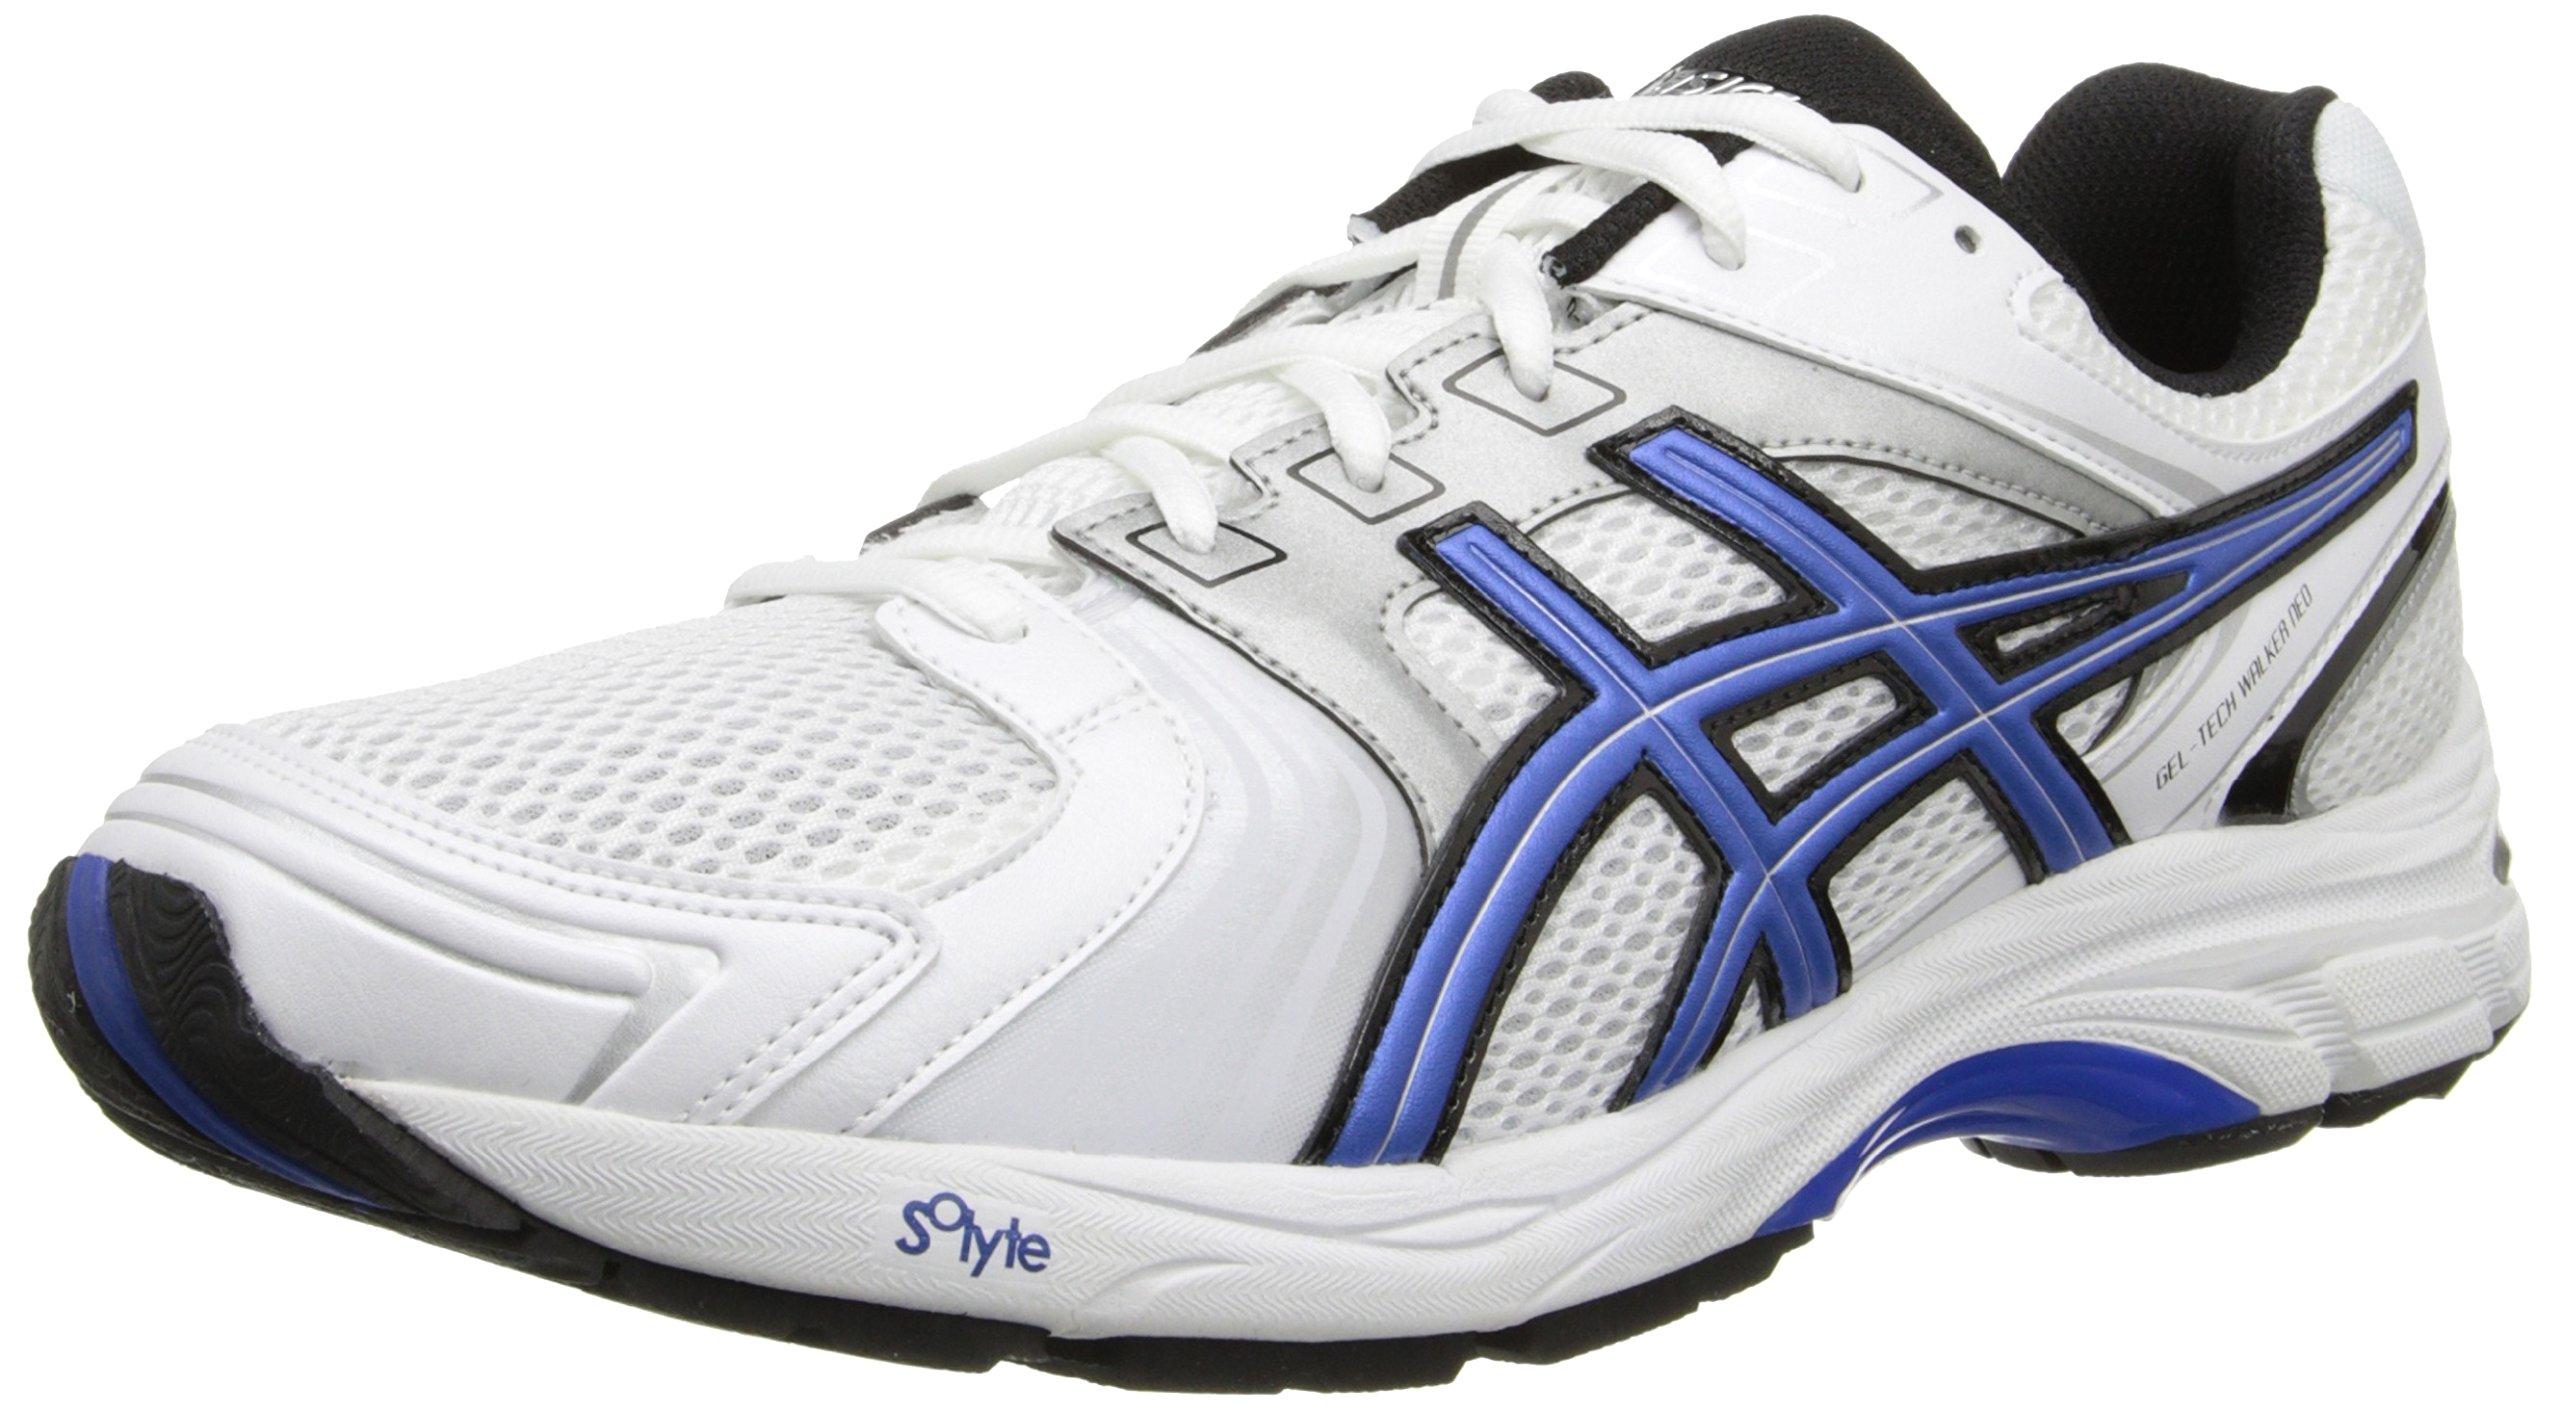 aeac0e22f88 Asics Men s GEL-Tech Walker Neo 4 Walking Shoe - Q418N.9090 ...